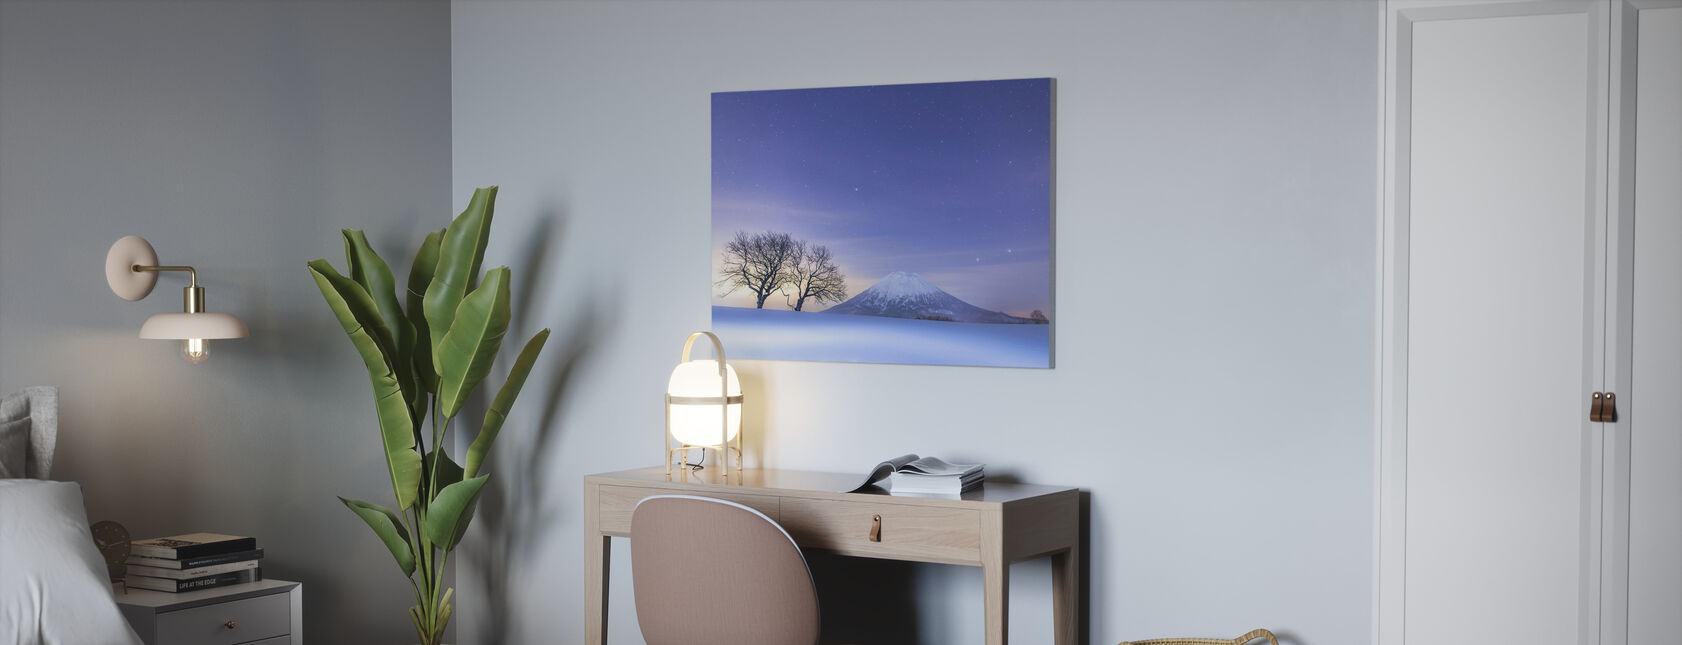 Blue Fantasy - Canvas print - Office